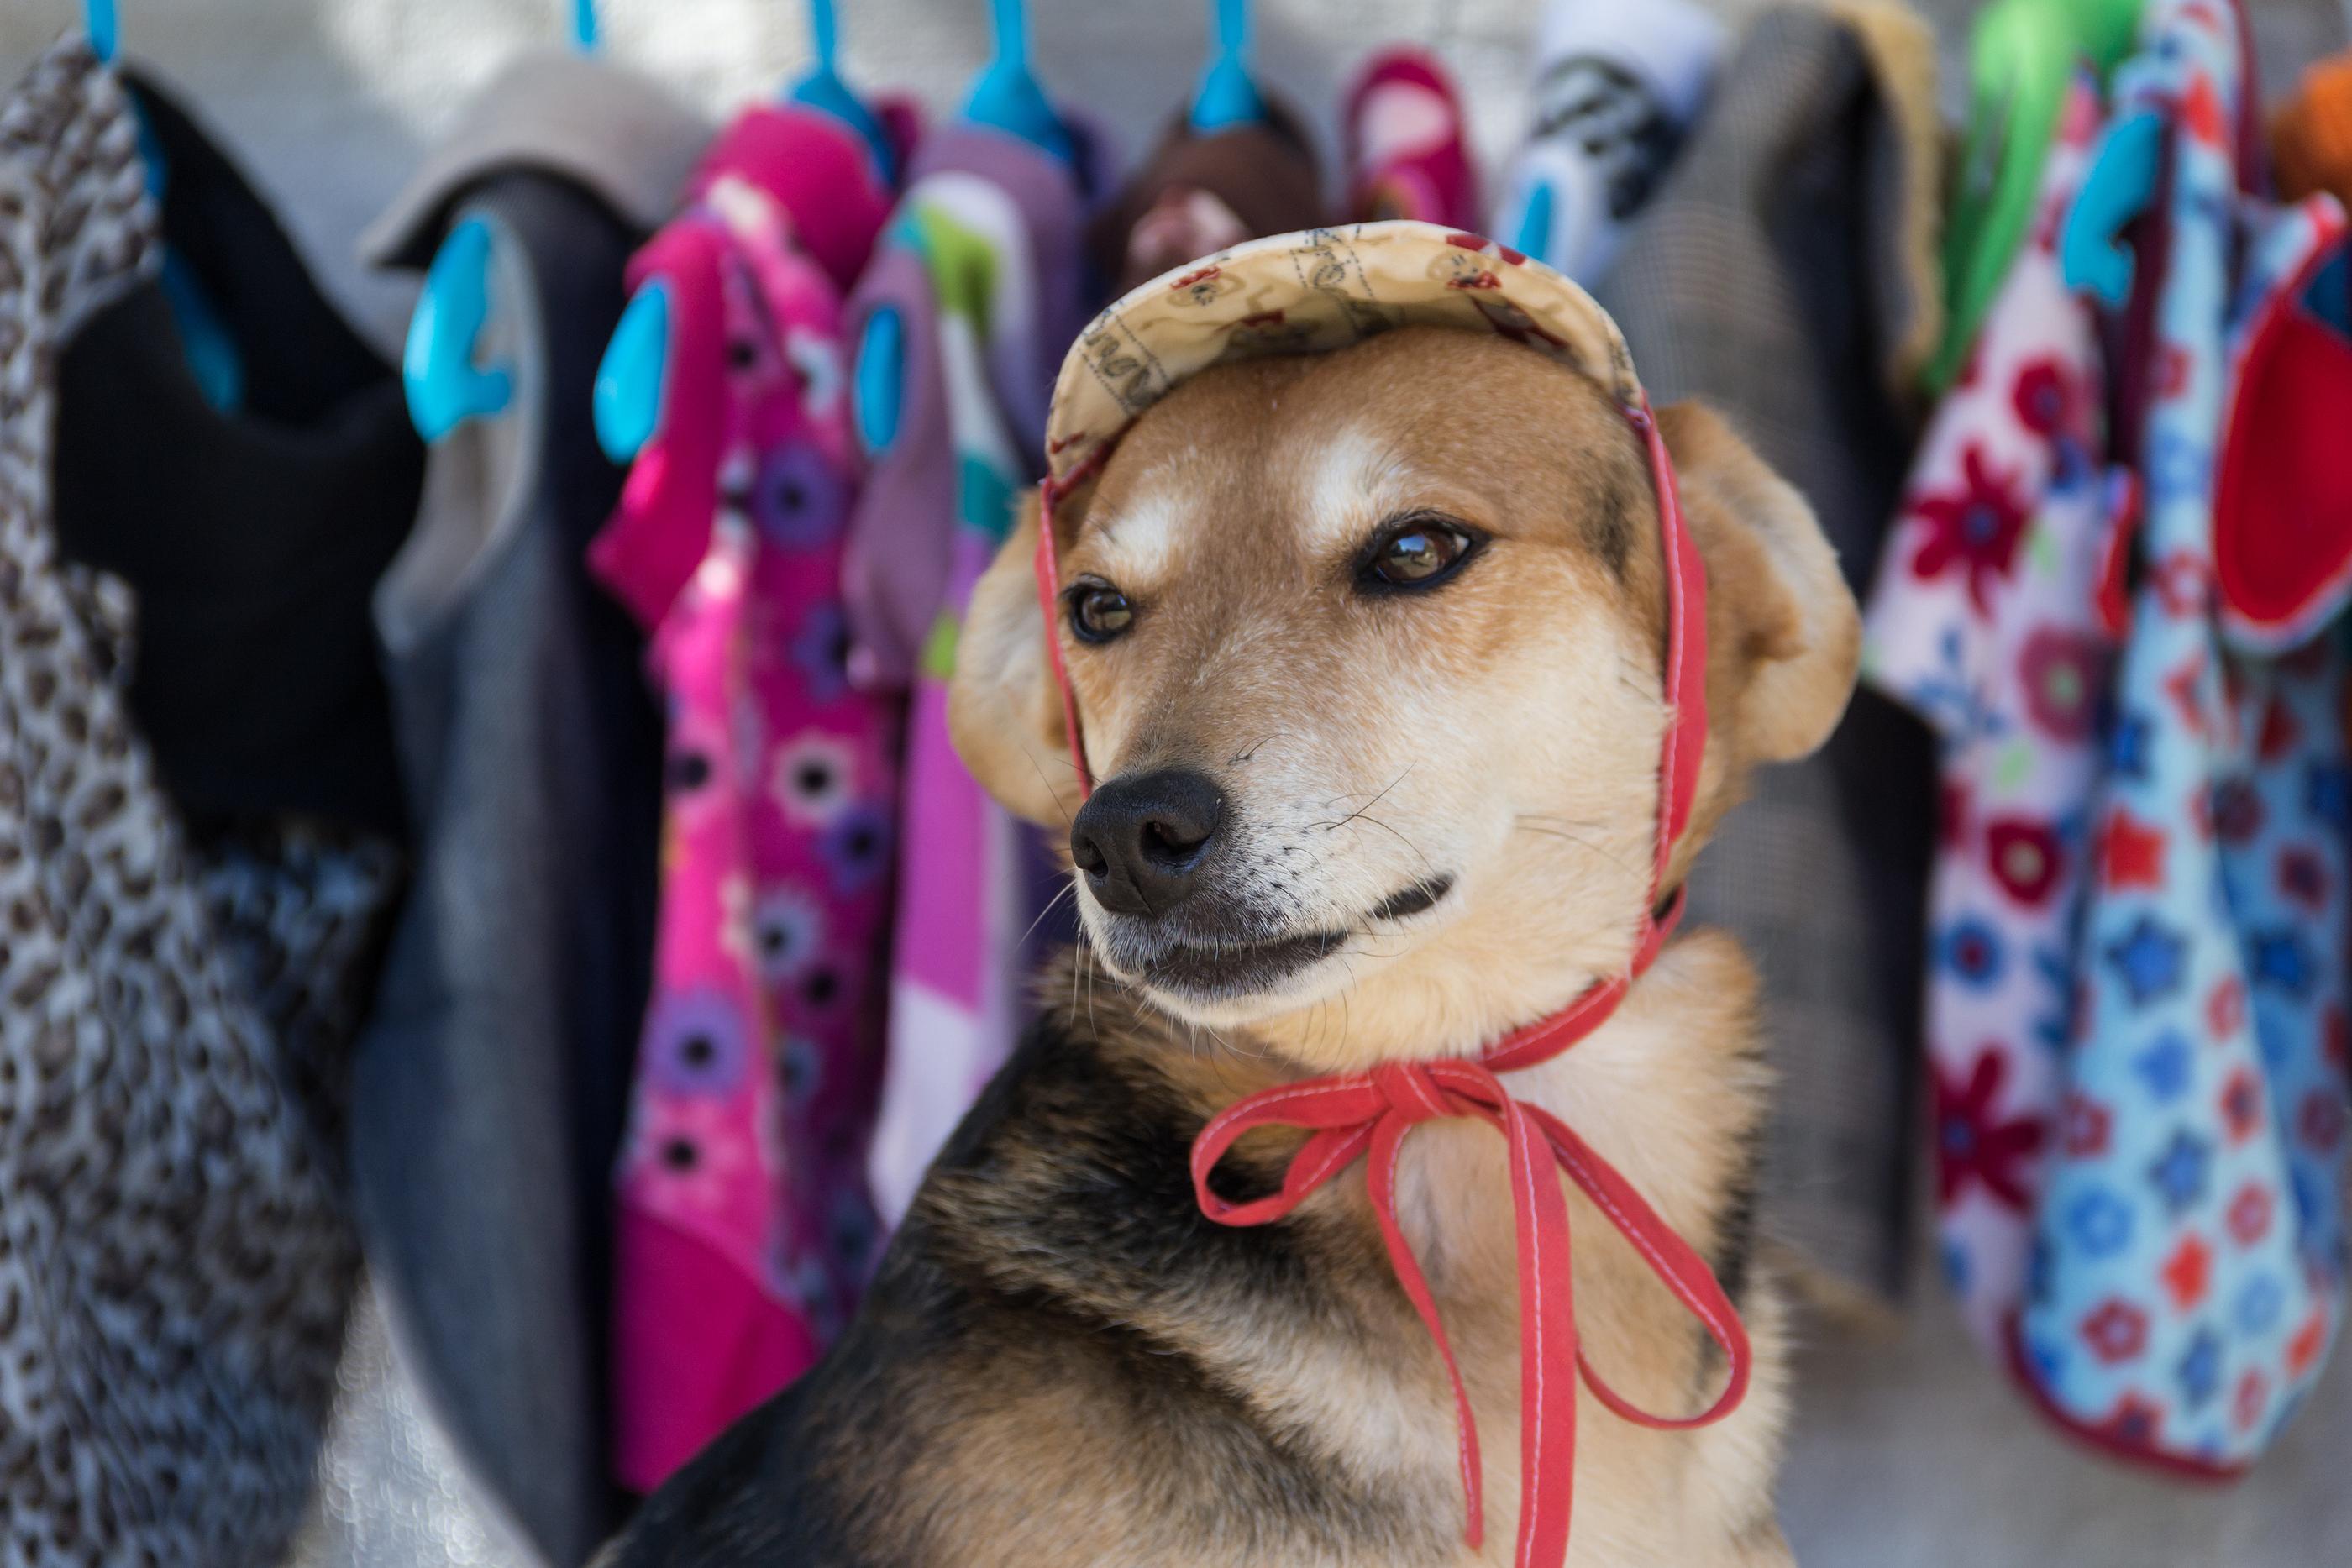 Pet stores, pet supply stores, pet companies